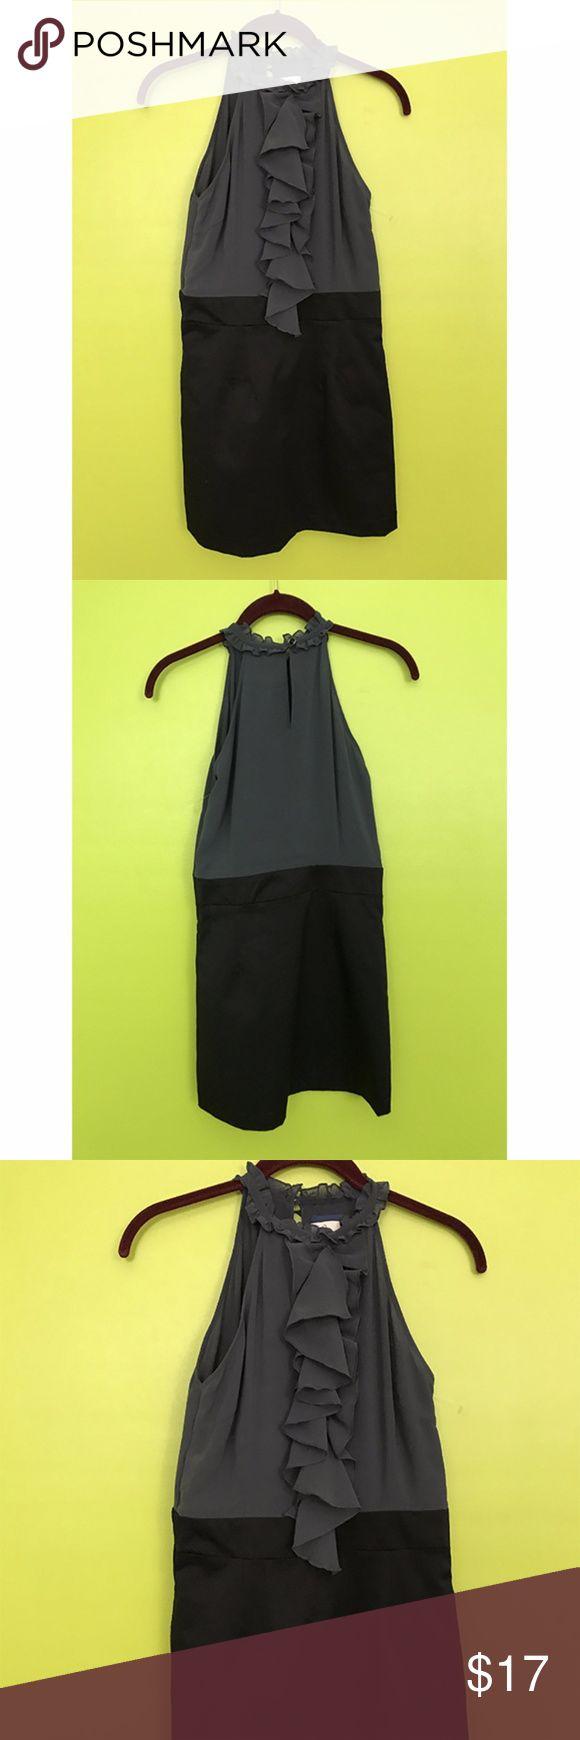 "Emmelee Anthropologie Ruffled Gray Black Dress S B720  Dress  Bust - 32"" Waist - 28"" Length - 31""  Emmelee Anthropologie Round Ruffle Neck Front Gray Top Black Skirt Dress Small  Free shipping on orders over $75 Emmelee Anthropologie Dresses"